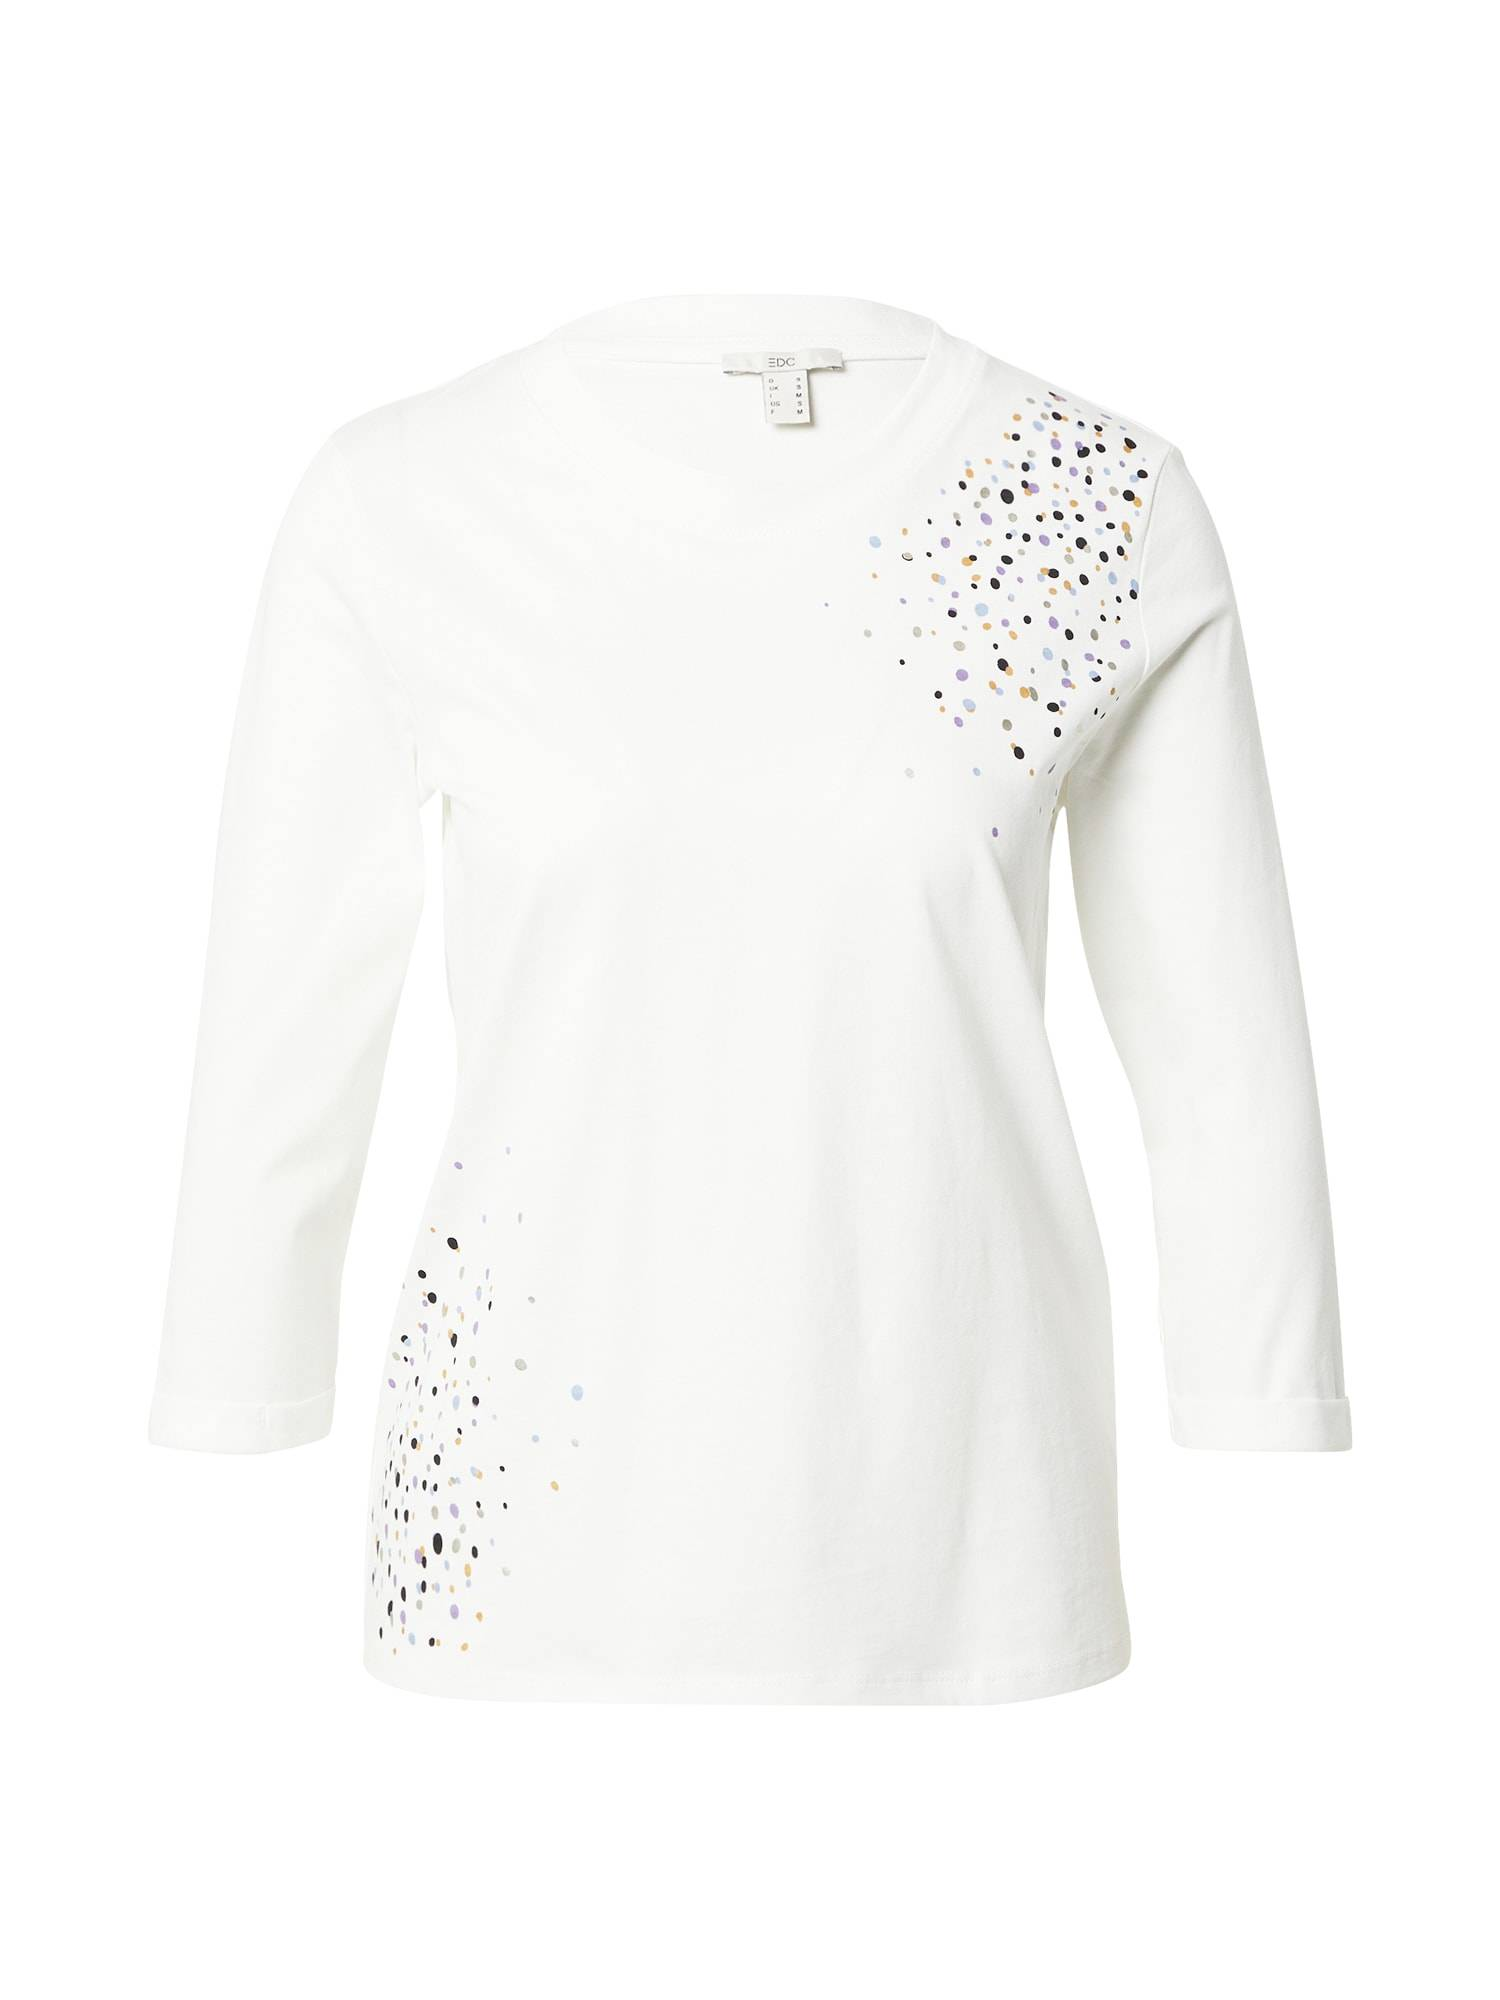 Esprit T-shirt  - Blanc - Taille: XS - female